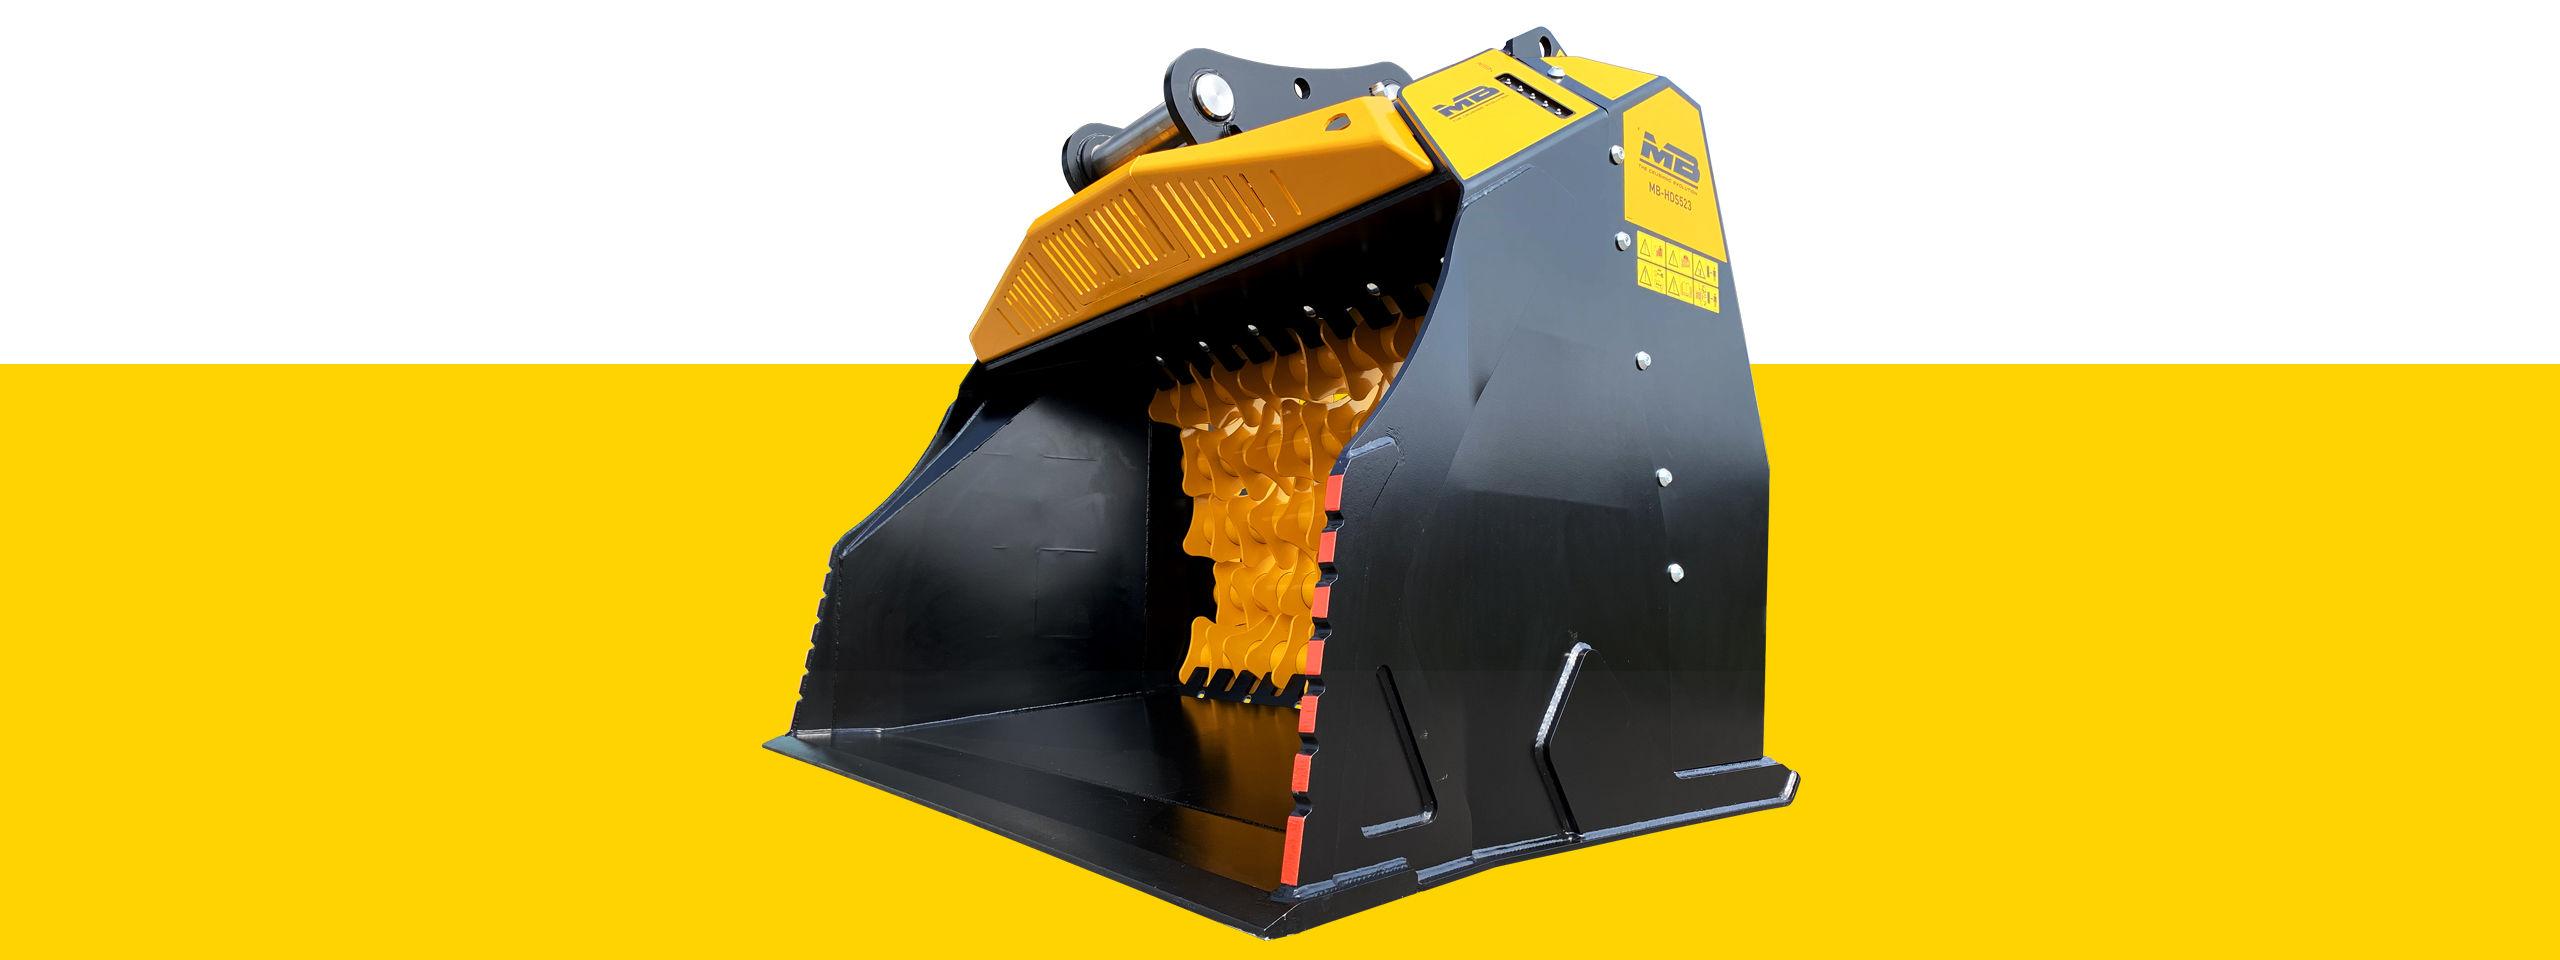 Nuova Benna Selezionatrice MB-HDS523 più potente!